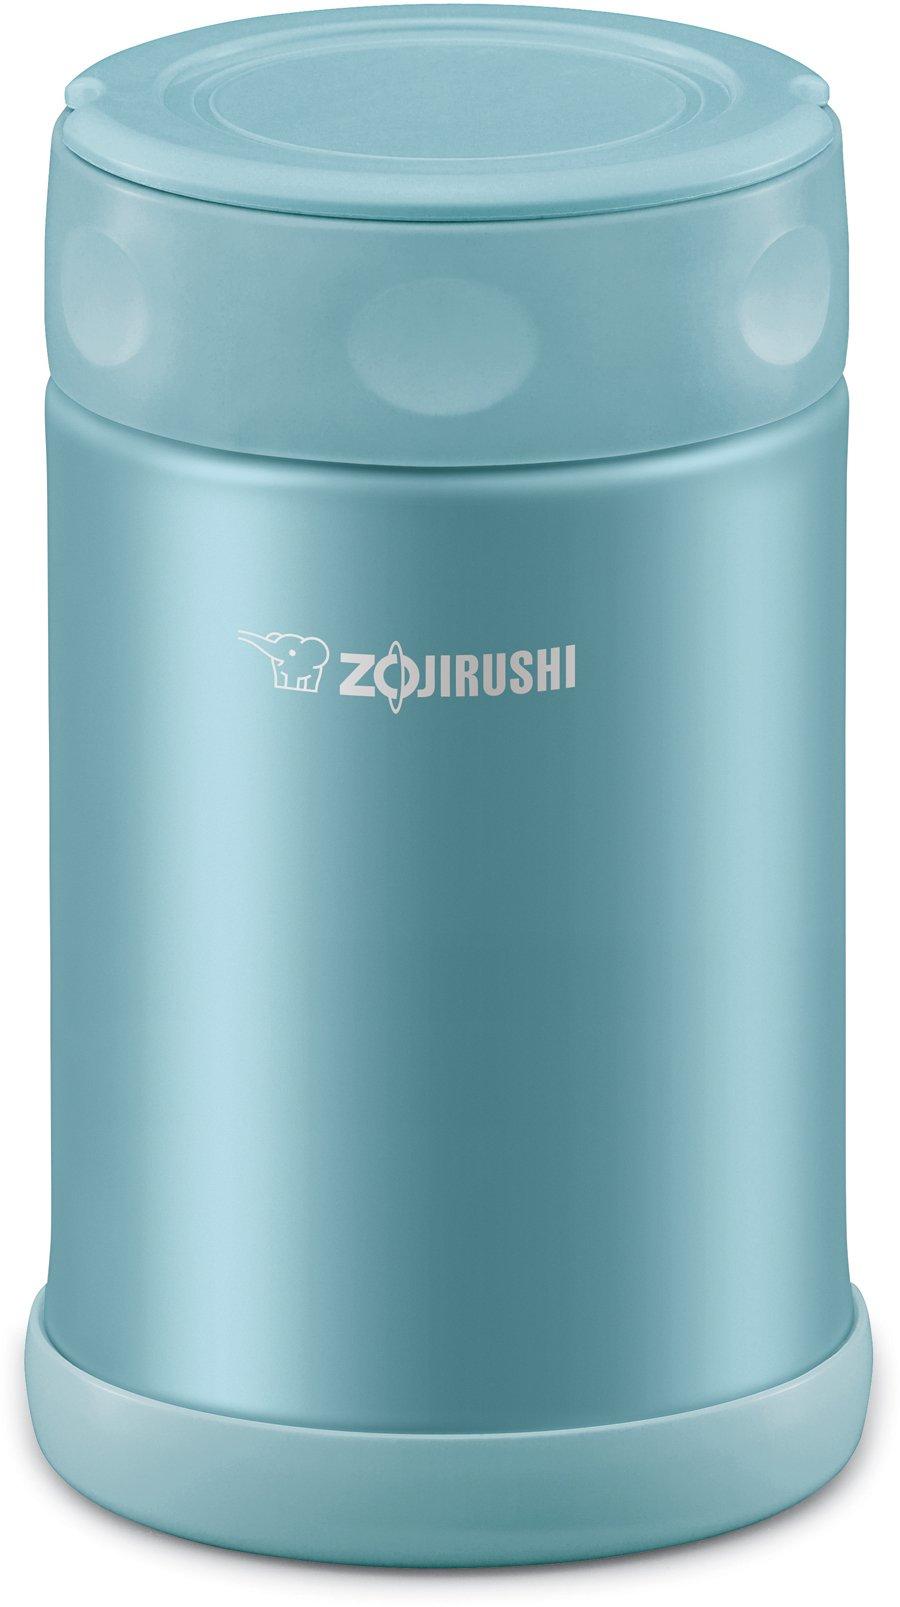 Zojirushi SW-EAE50AB Stainless Steel Food Jar, 17-Ounce/0.5-Liter, Aqua Blue